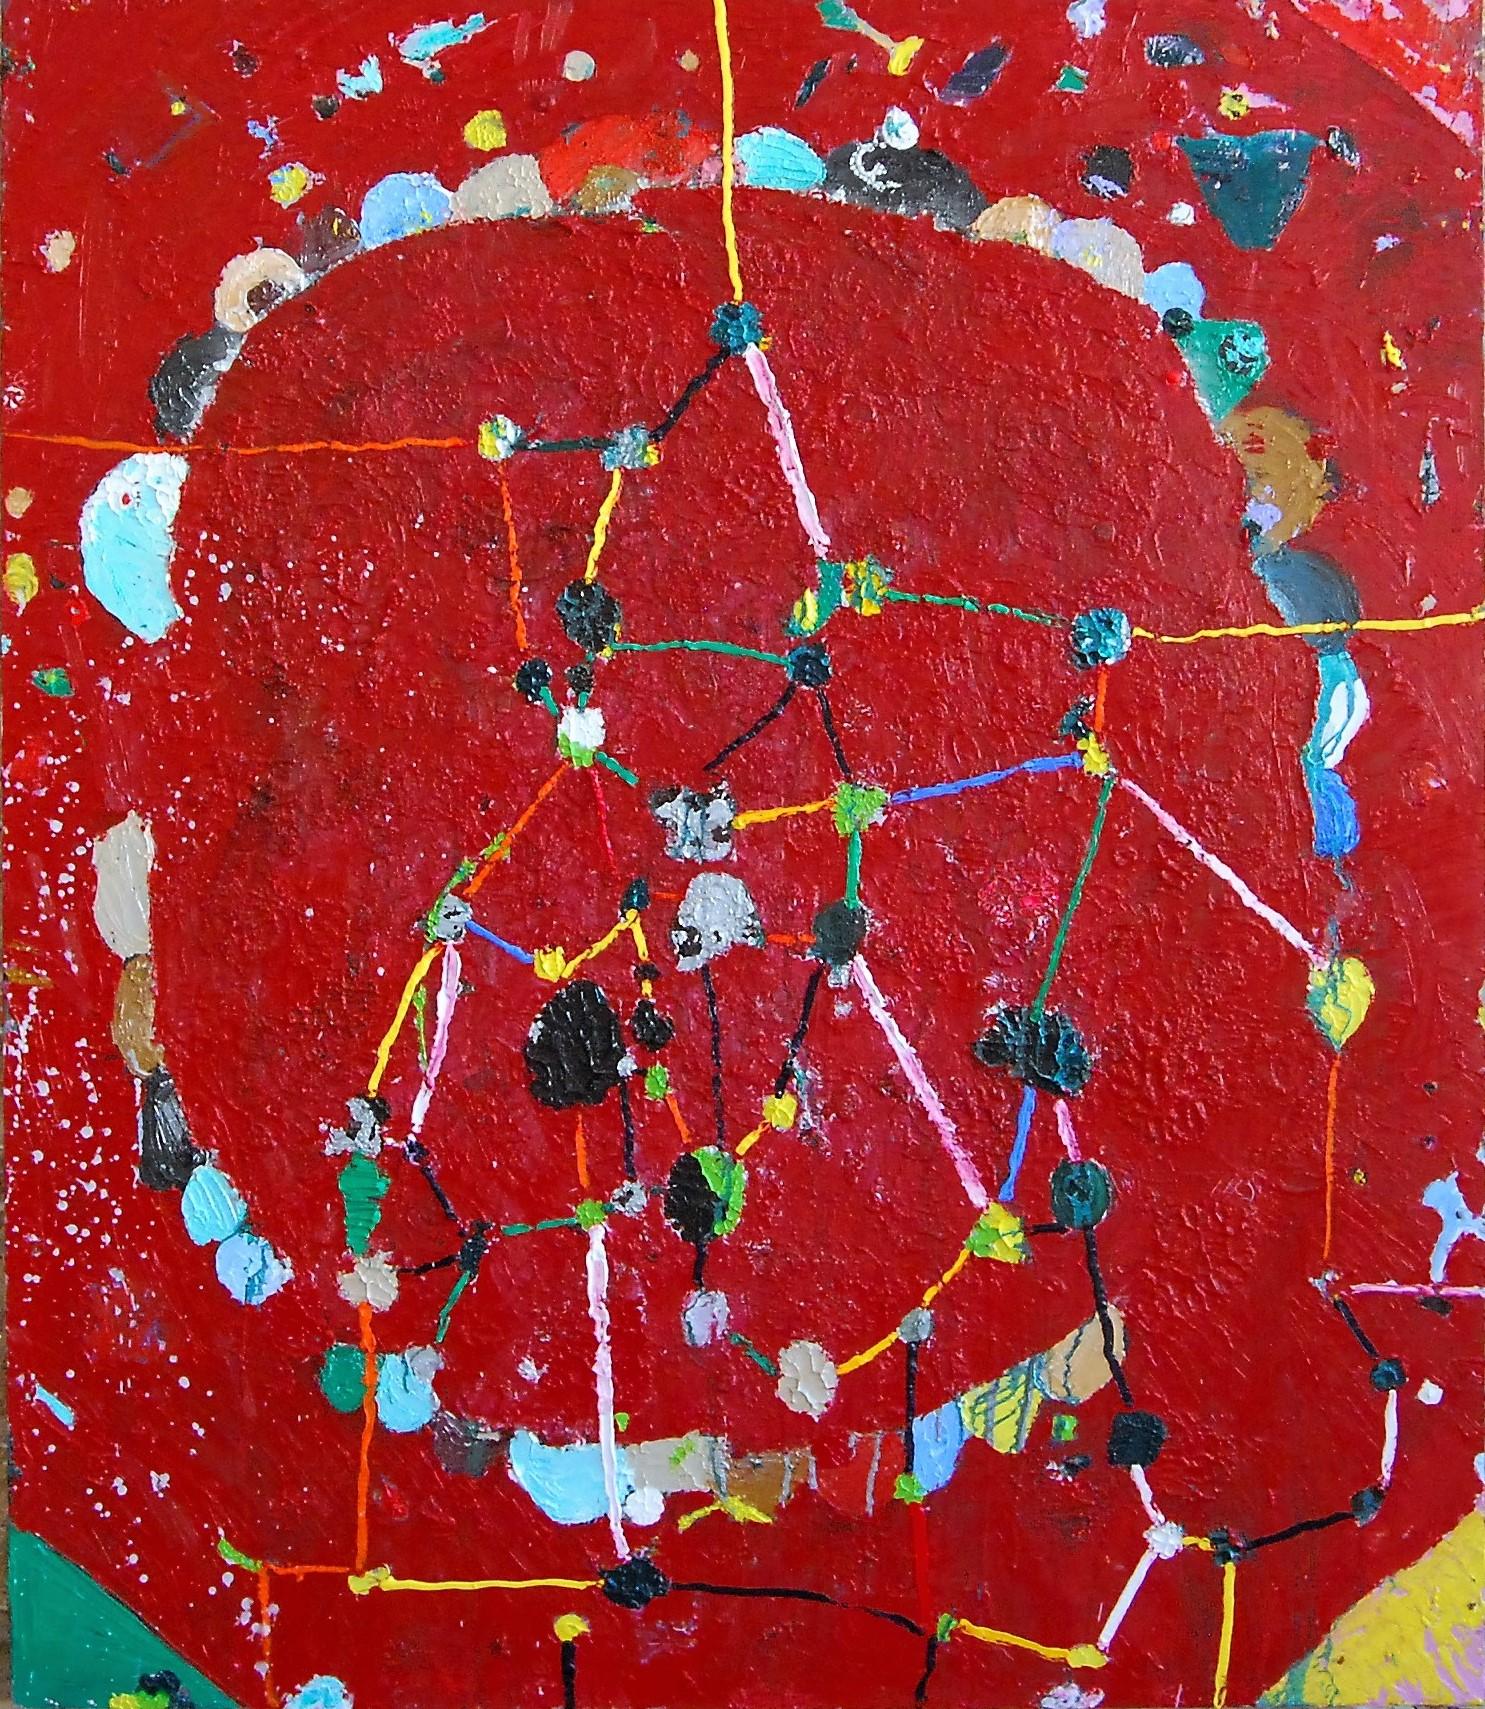 Valerie Brennan, Unagi, oil and spray paint on Masonite, 180 x 150 cm, 2015 (cou